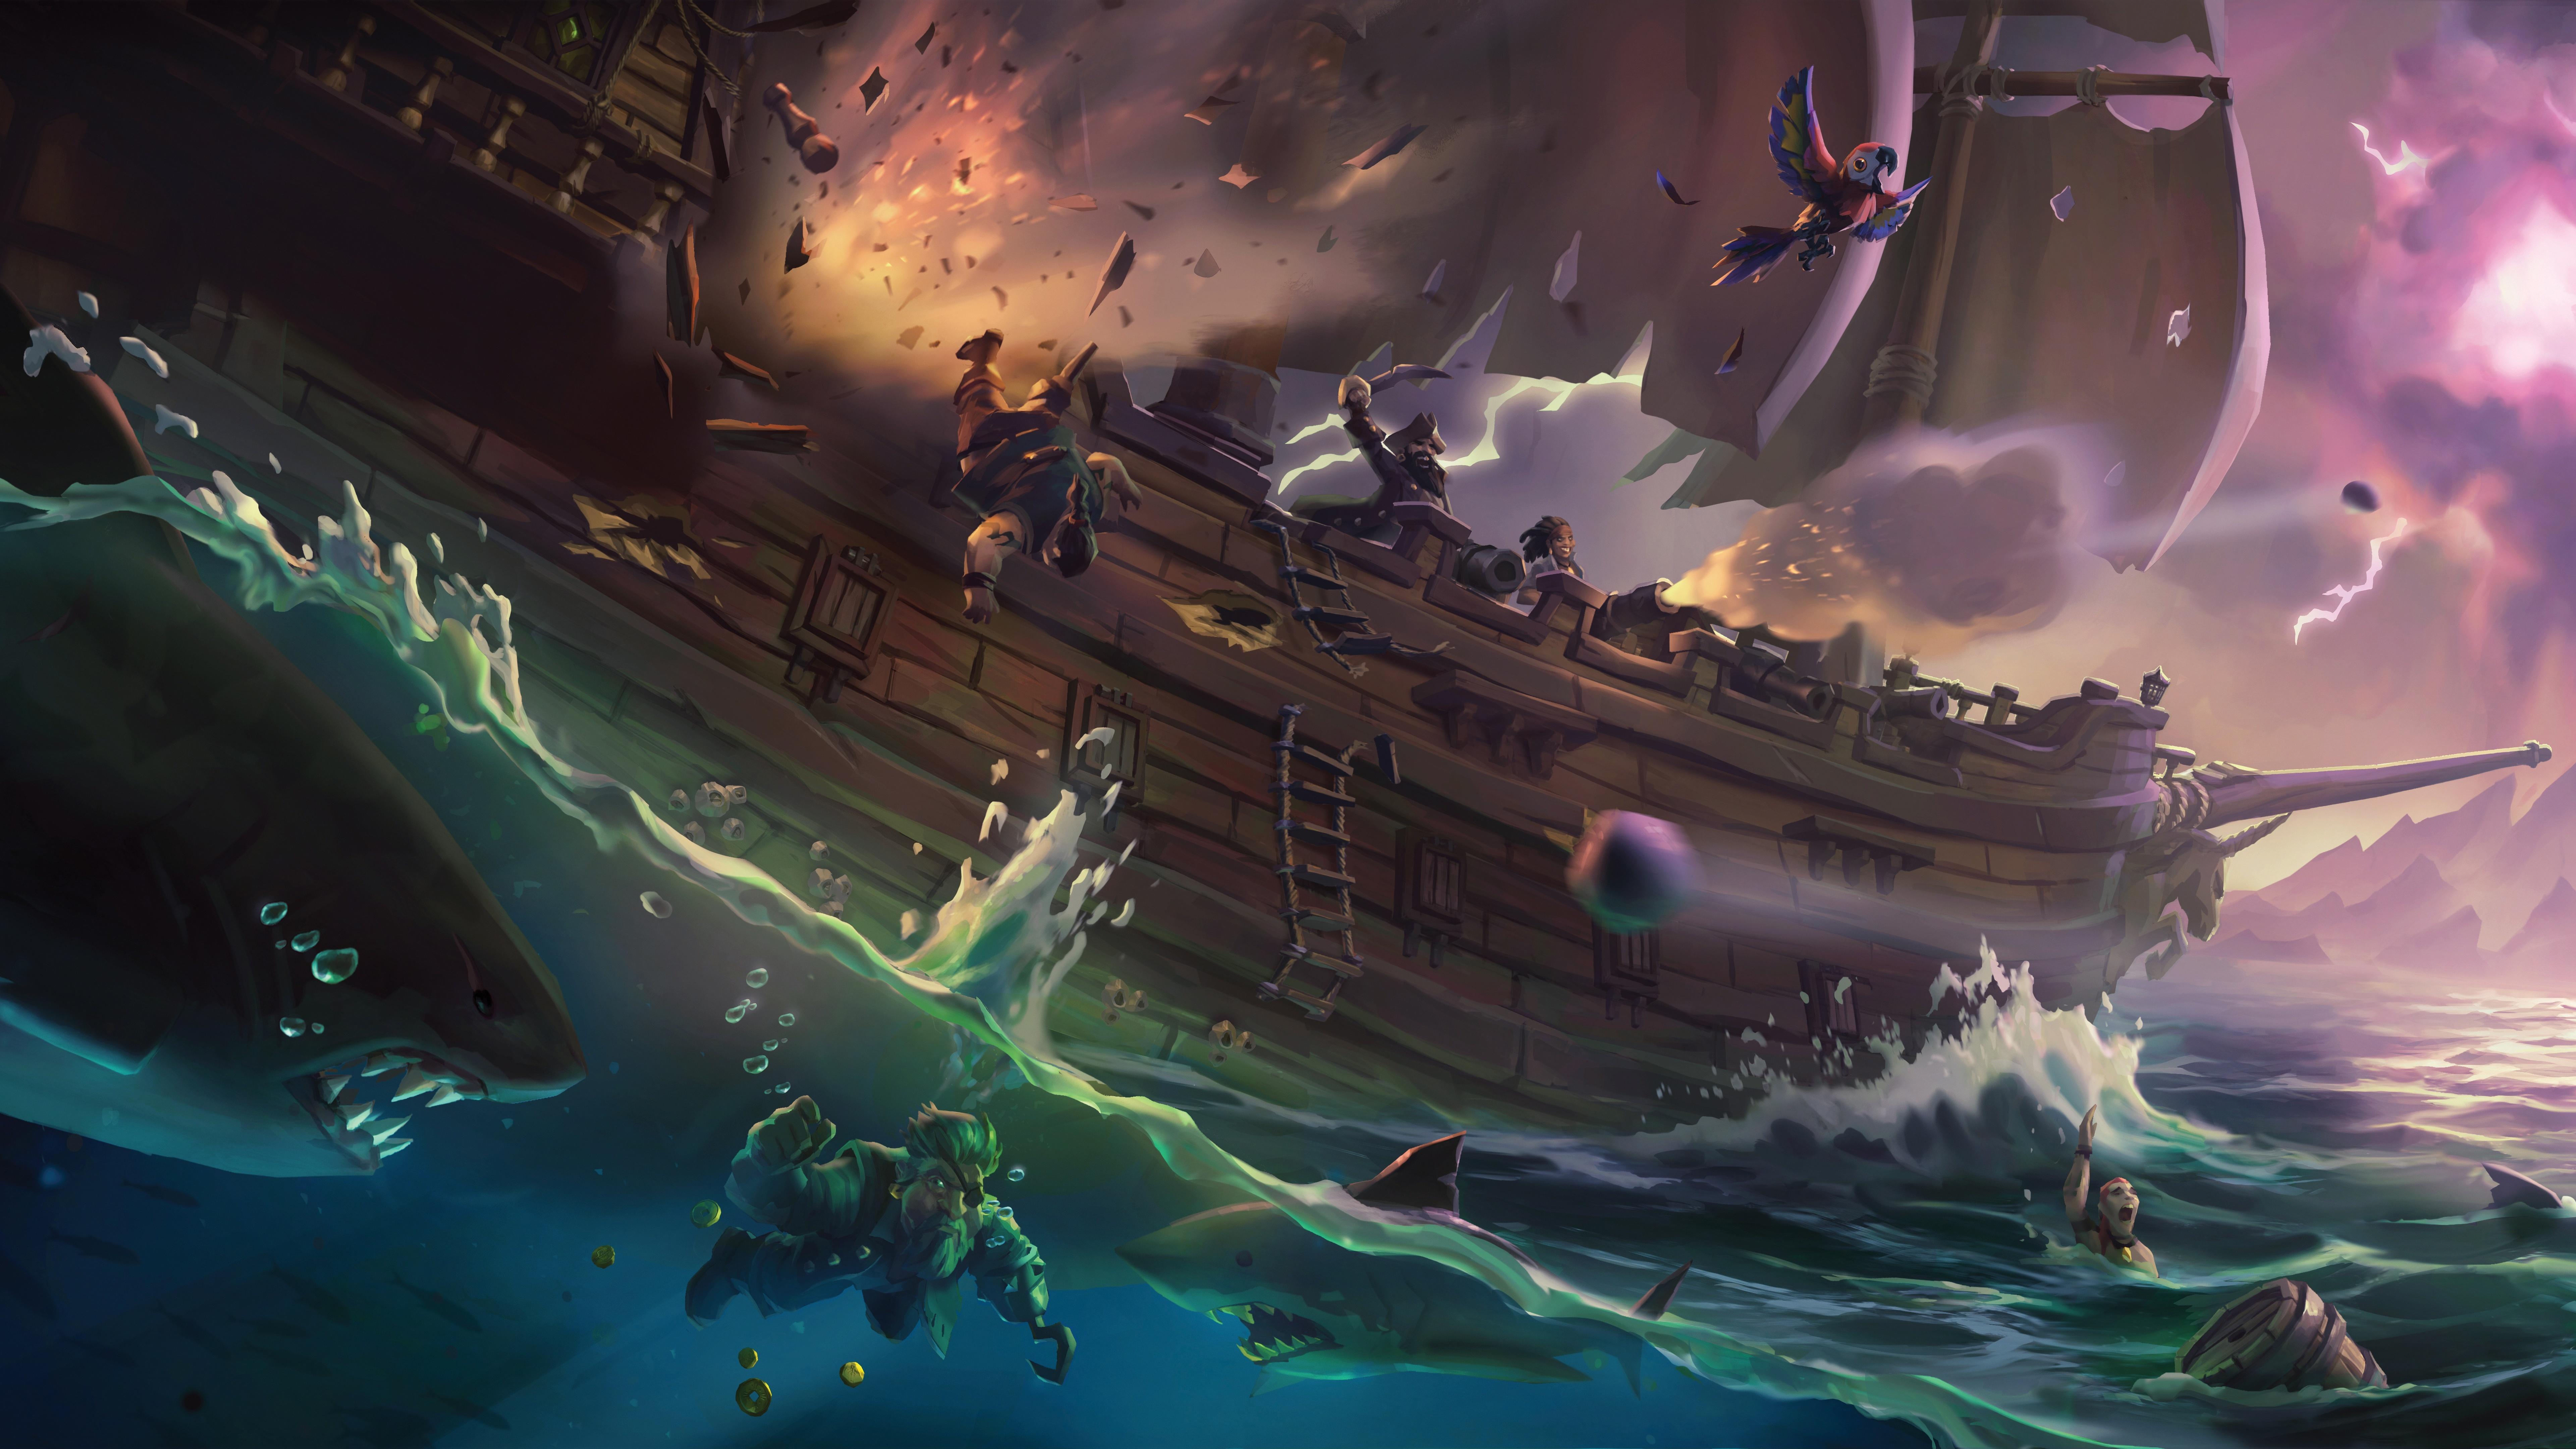 سی دی کی اریجینال بازی Sea Of Thieves Anniversary Edition | ایکس باکس/ویندوز 10